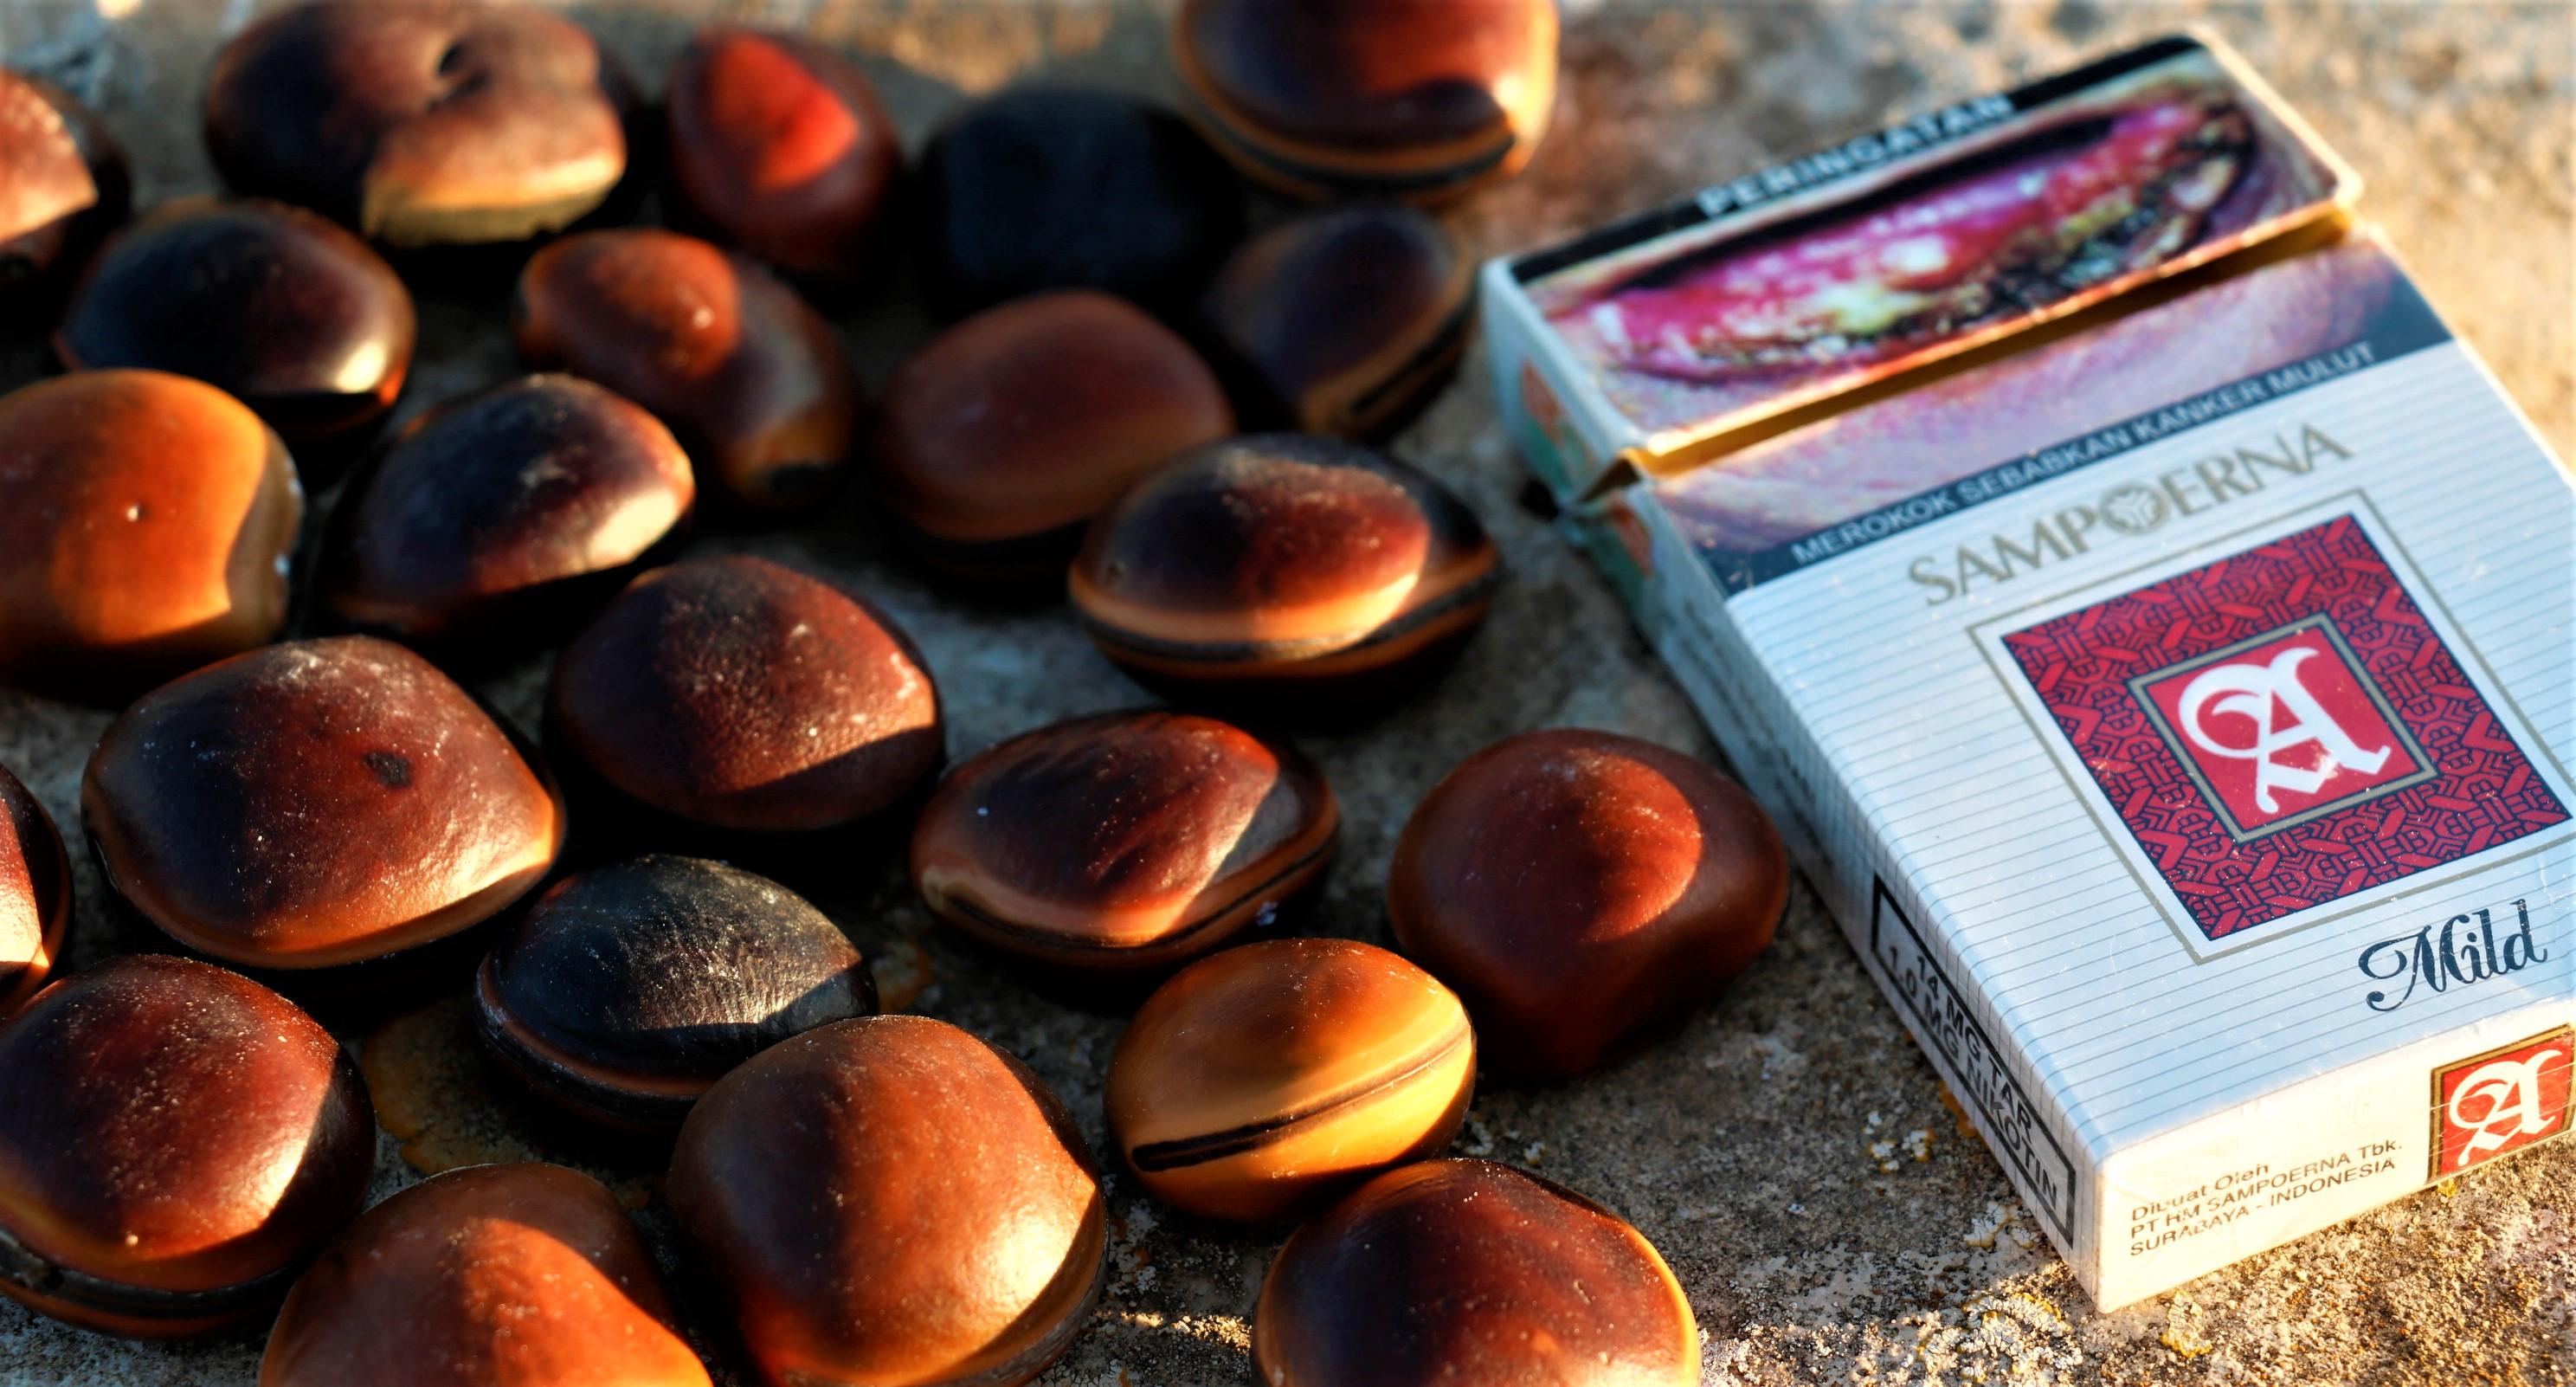 sampoerna tabac clou de girofle indonésie